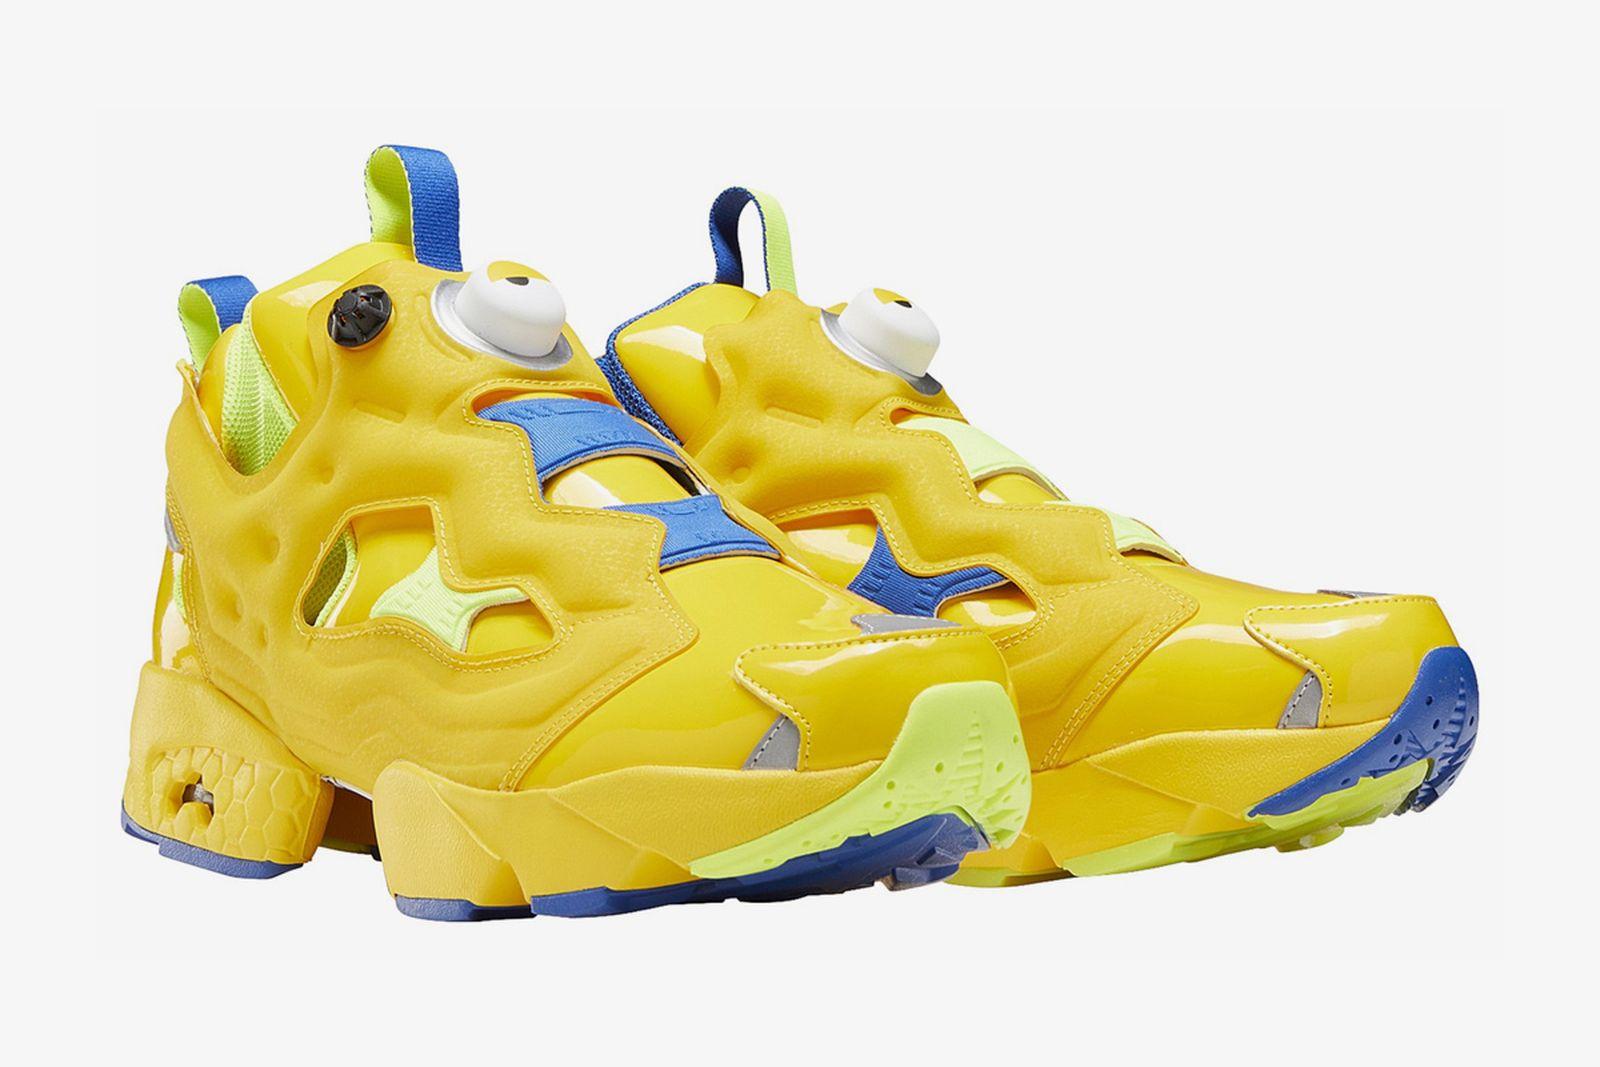 Yellow and blue Minion-themed Reebok Instapump Fury OG